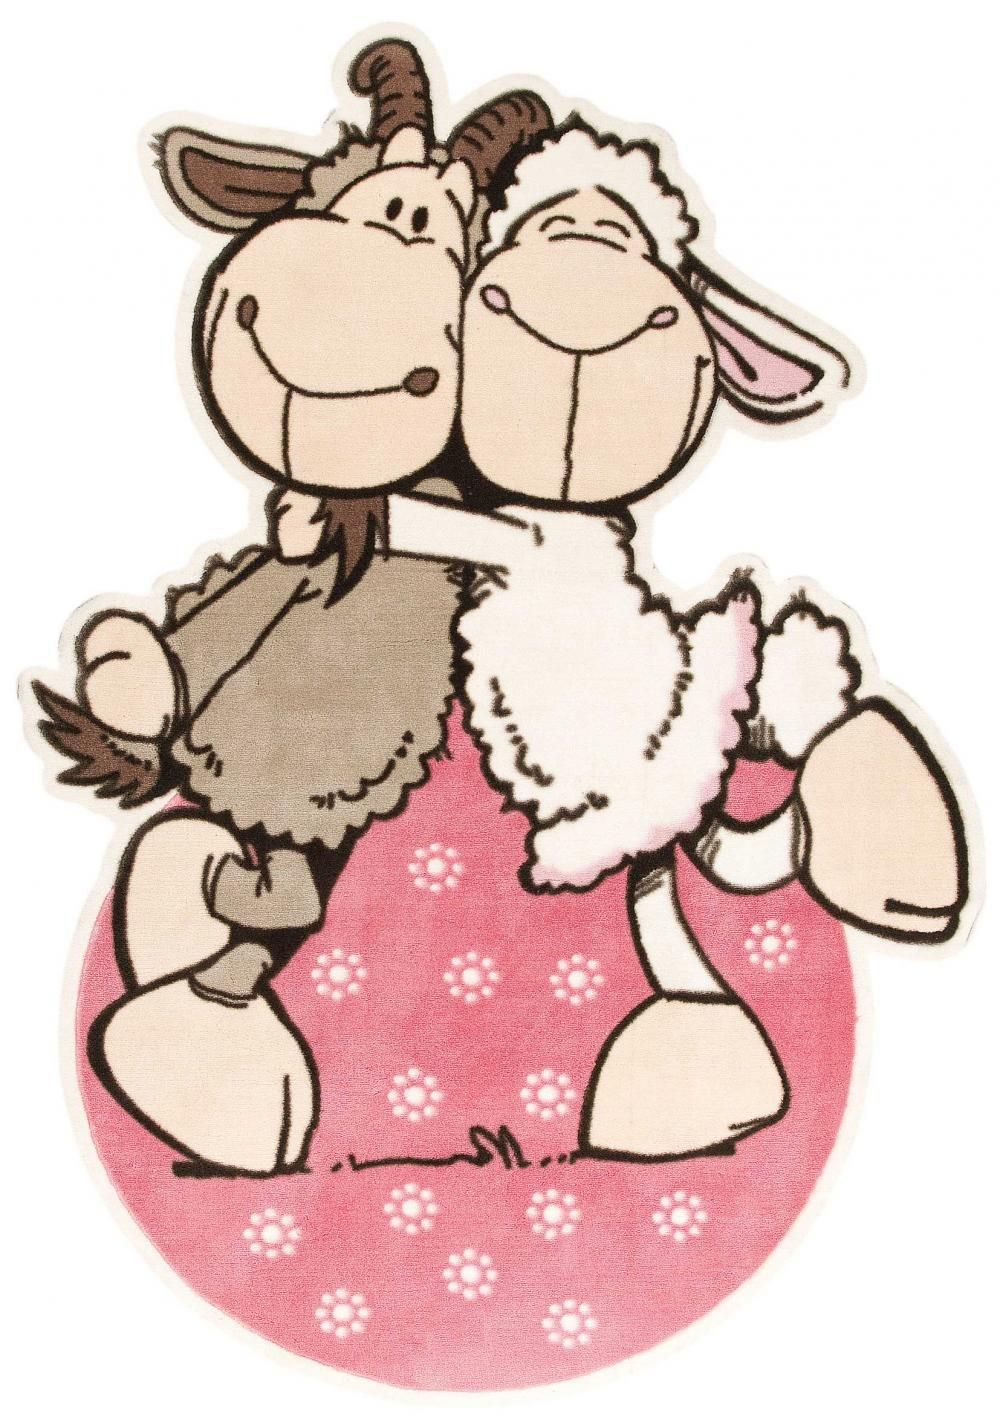 Елена поплянова – весёлые овечки (плюс)